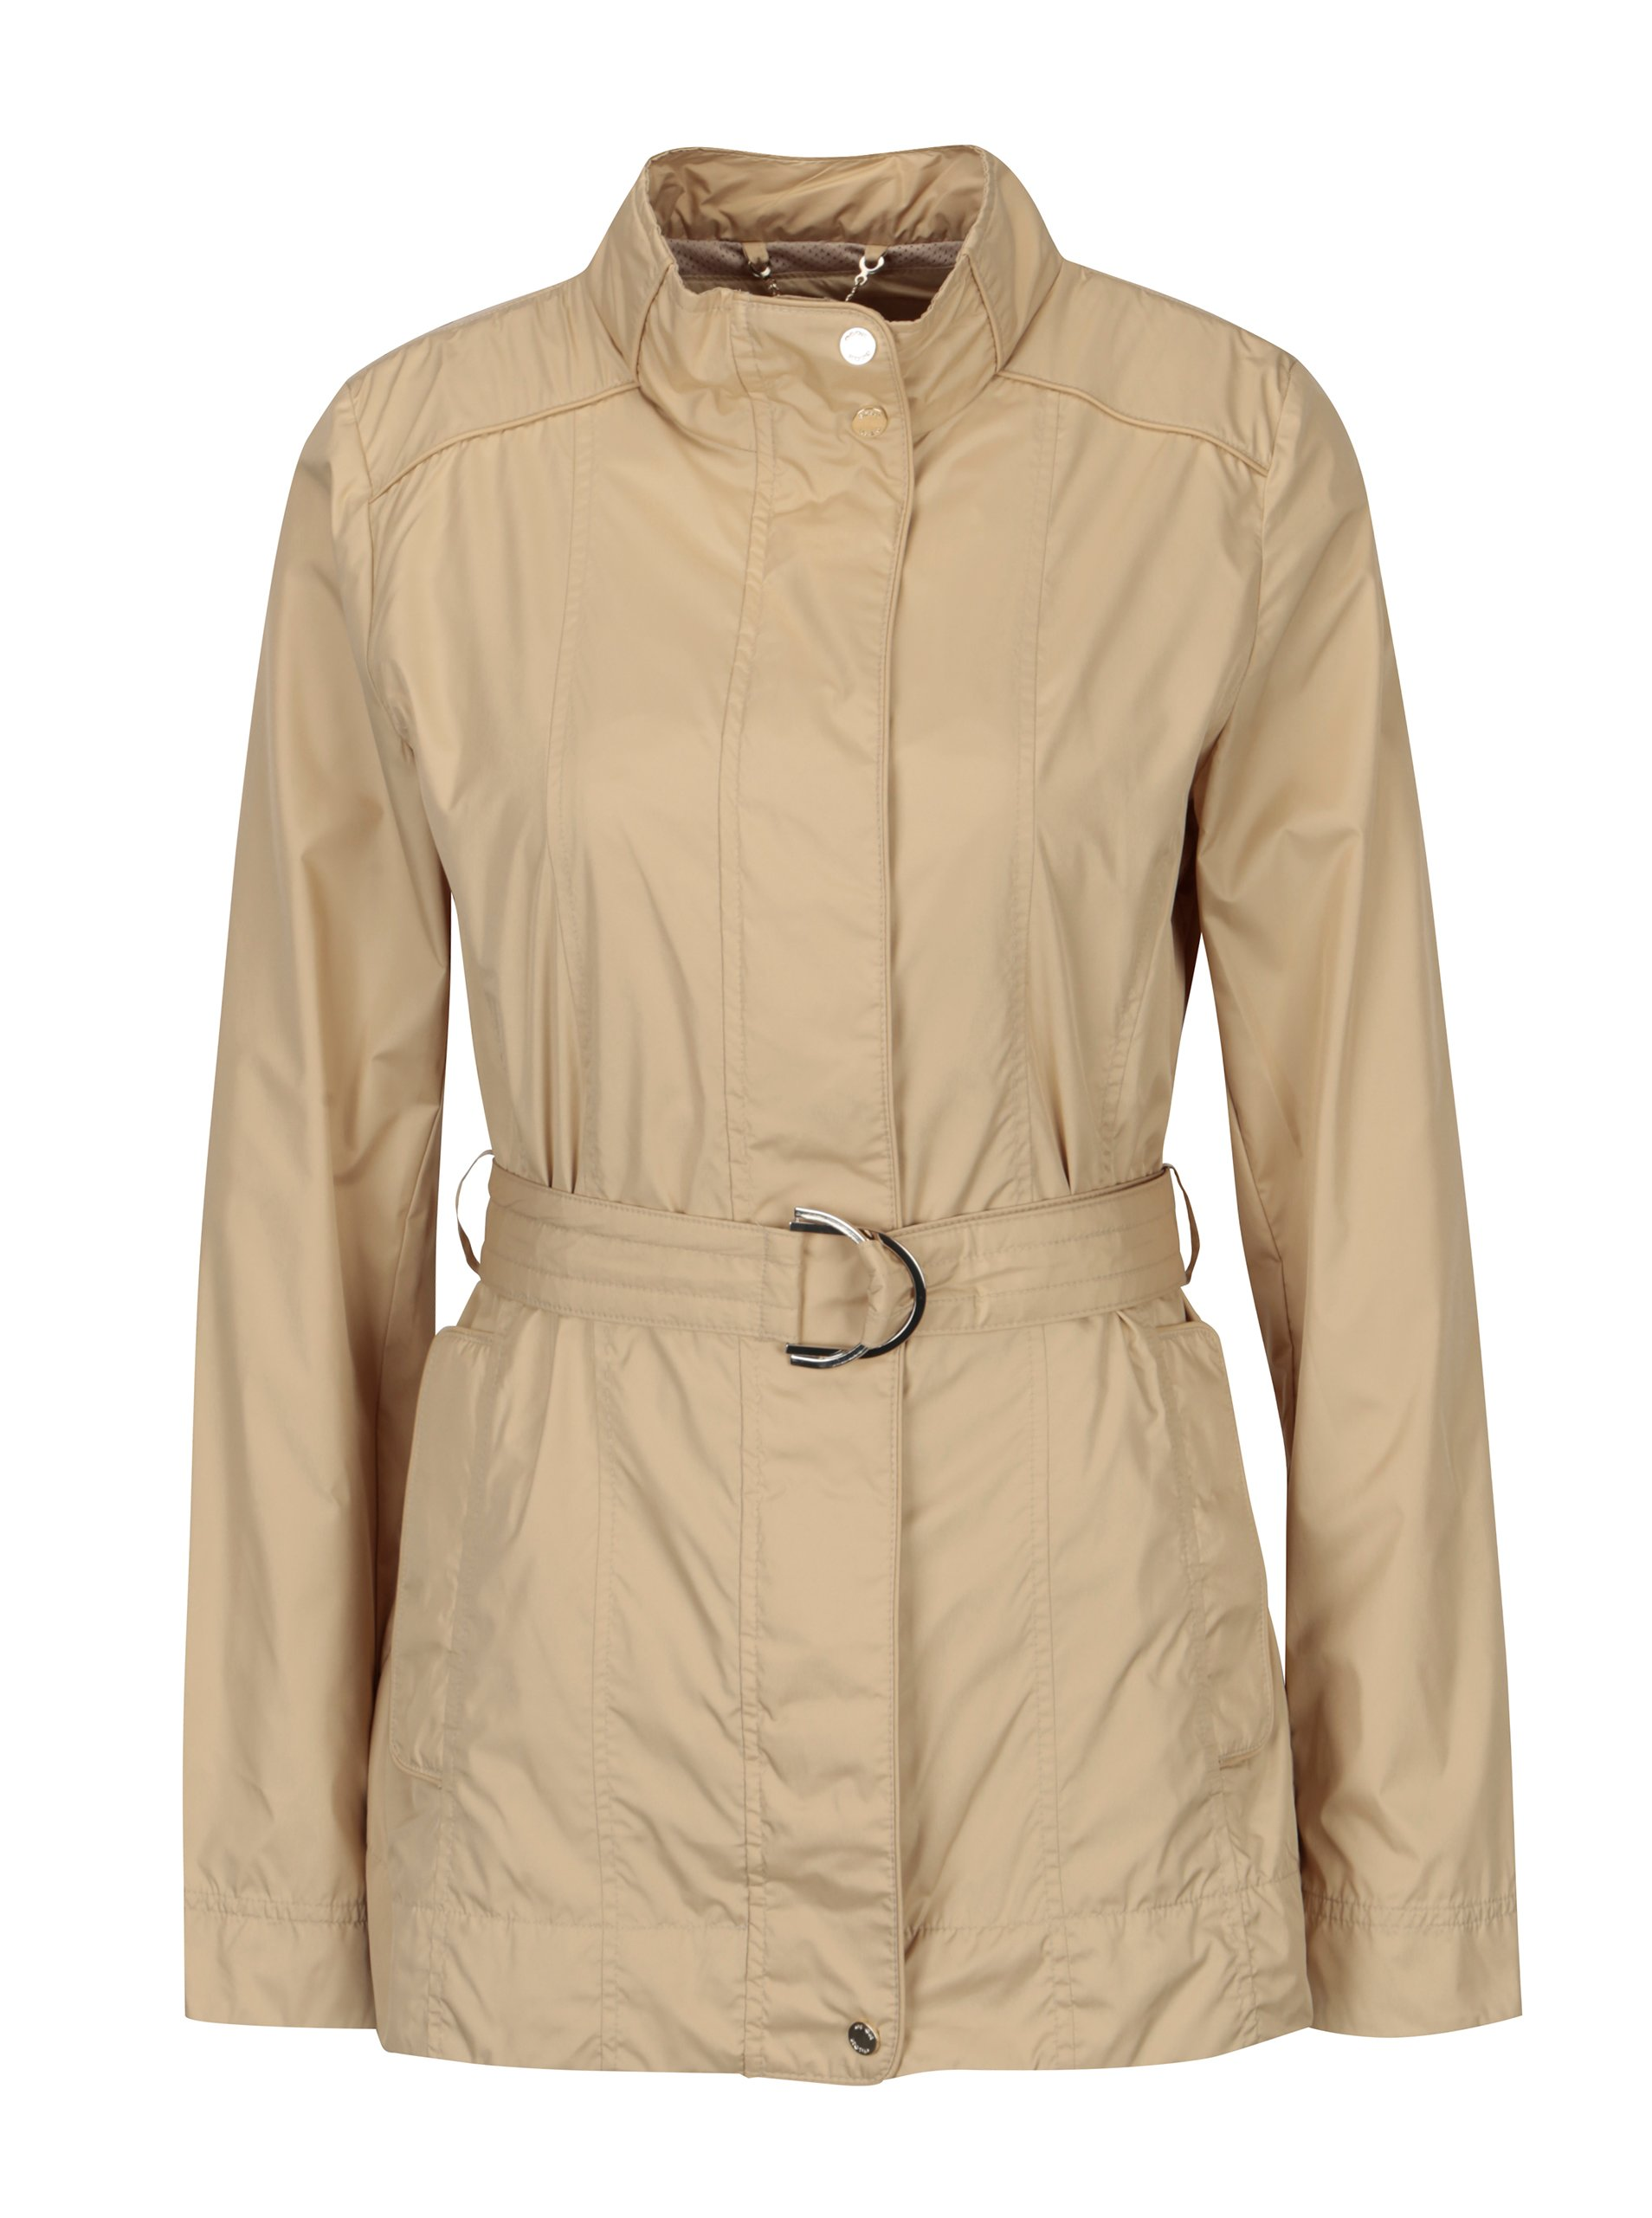 Fotografie Béžová dámská lehká bunda s páskem Geox